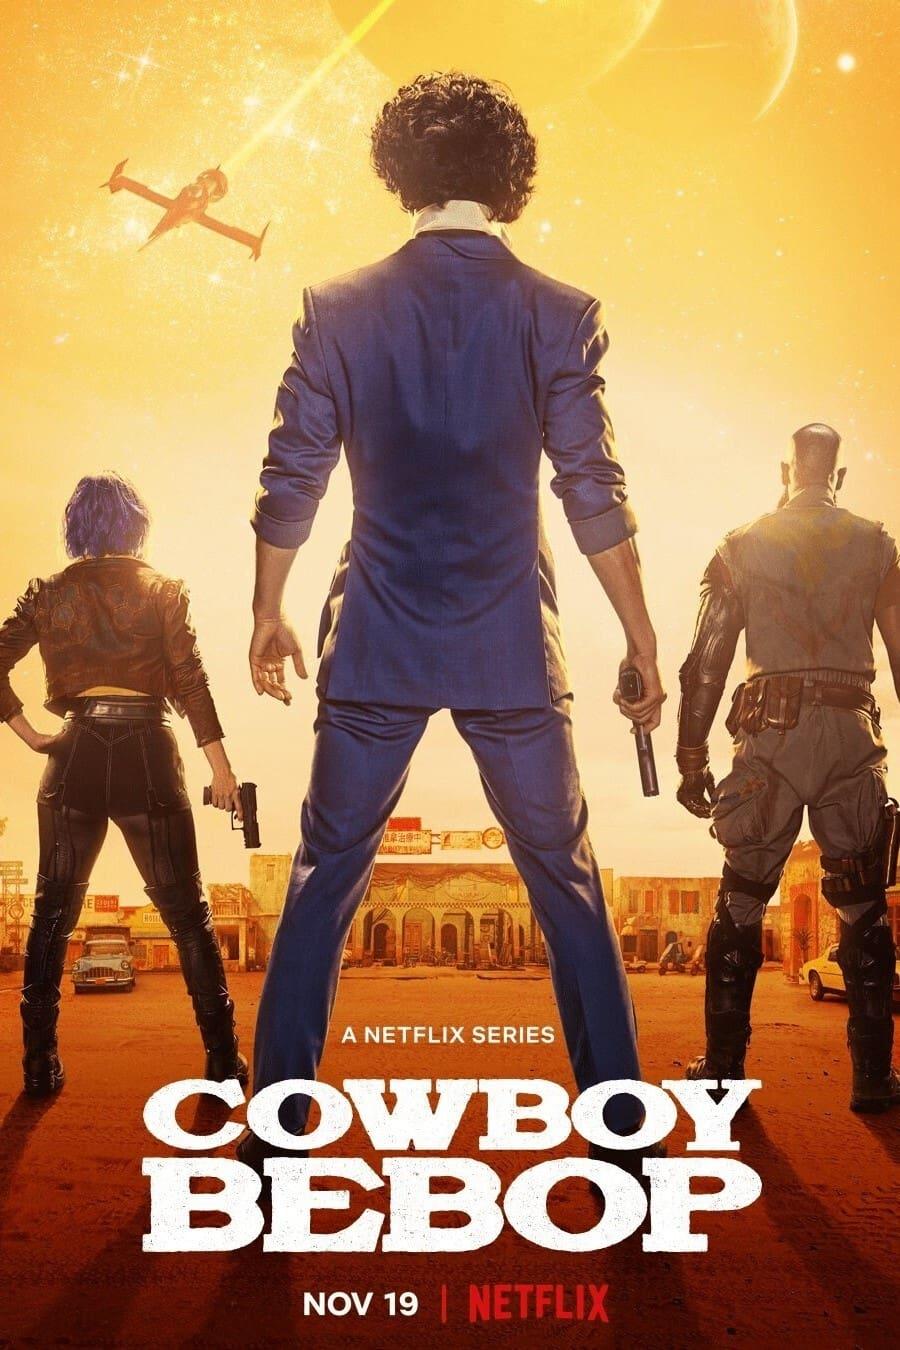 Cowboy Bebop TV Shows About Action Hero